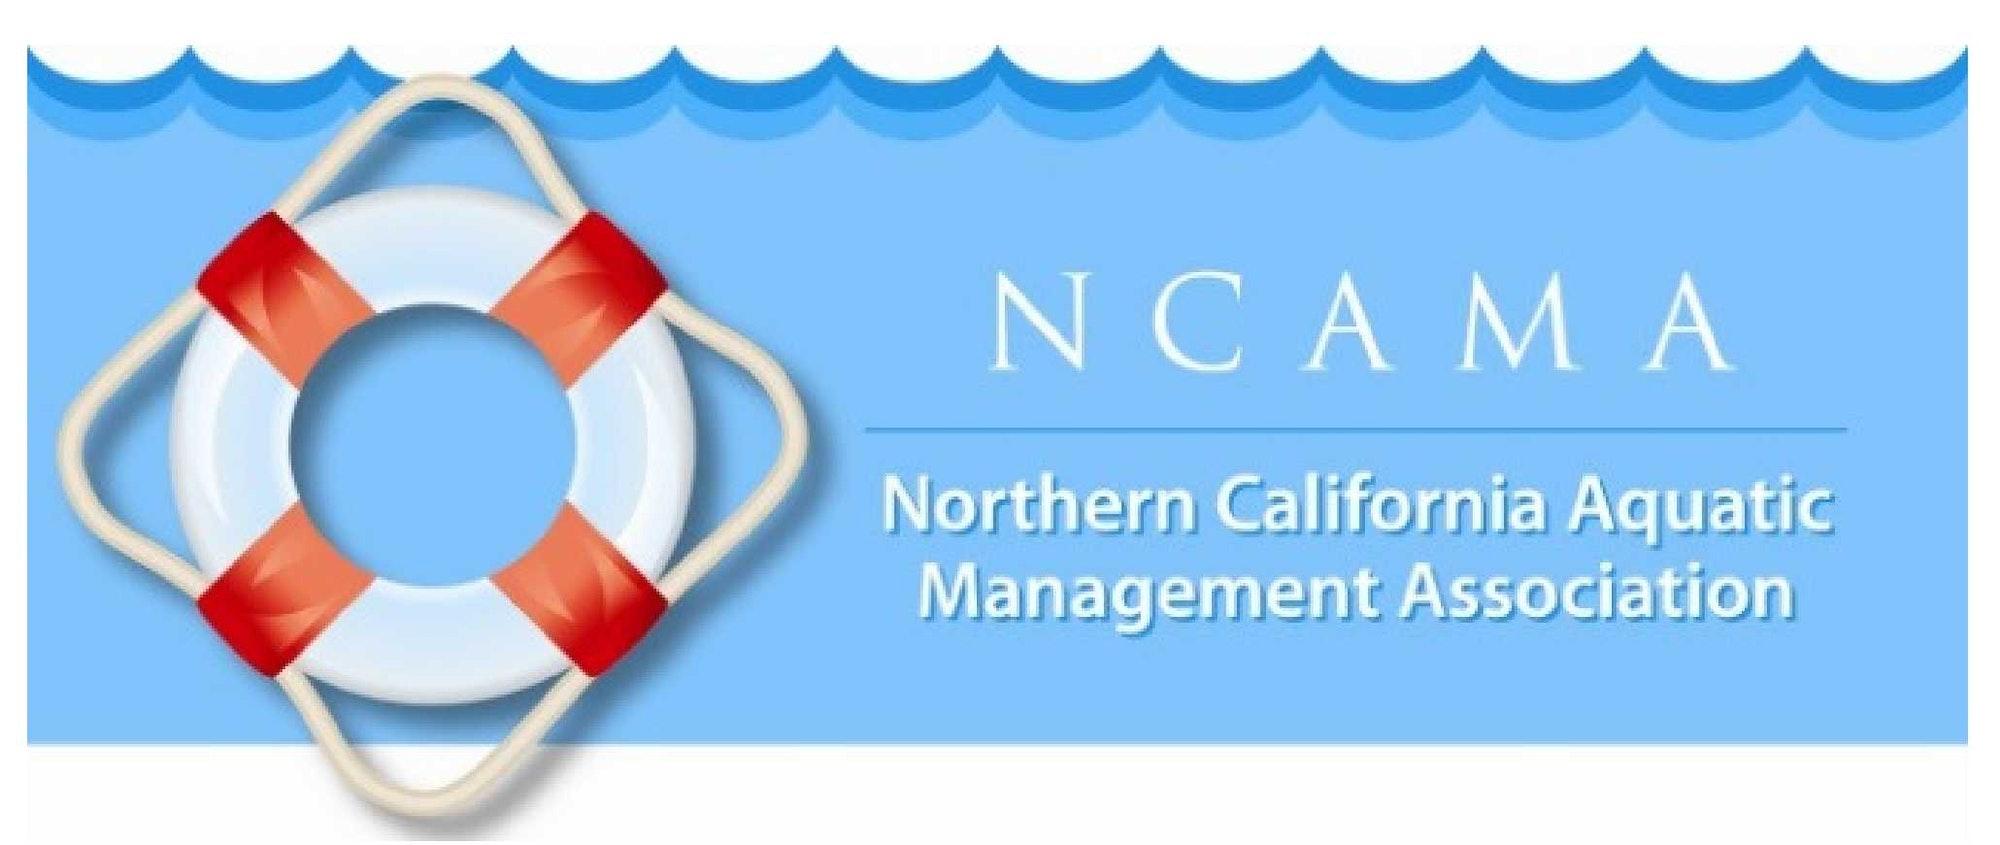 Northern California Aquatic Management Association Logo